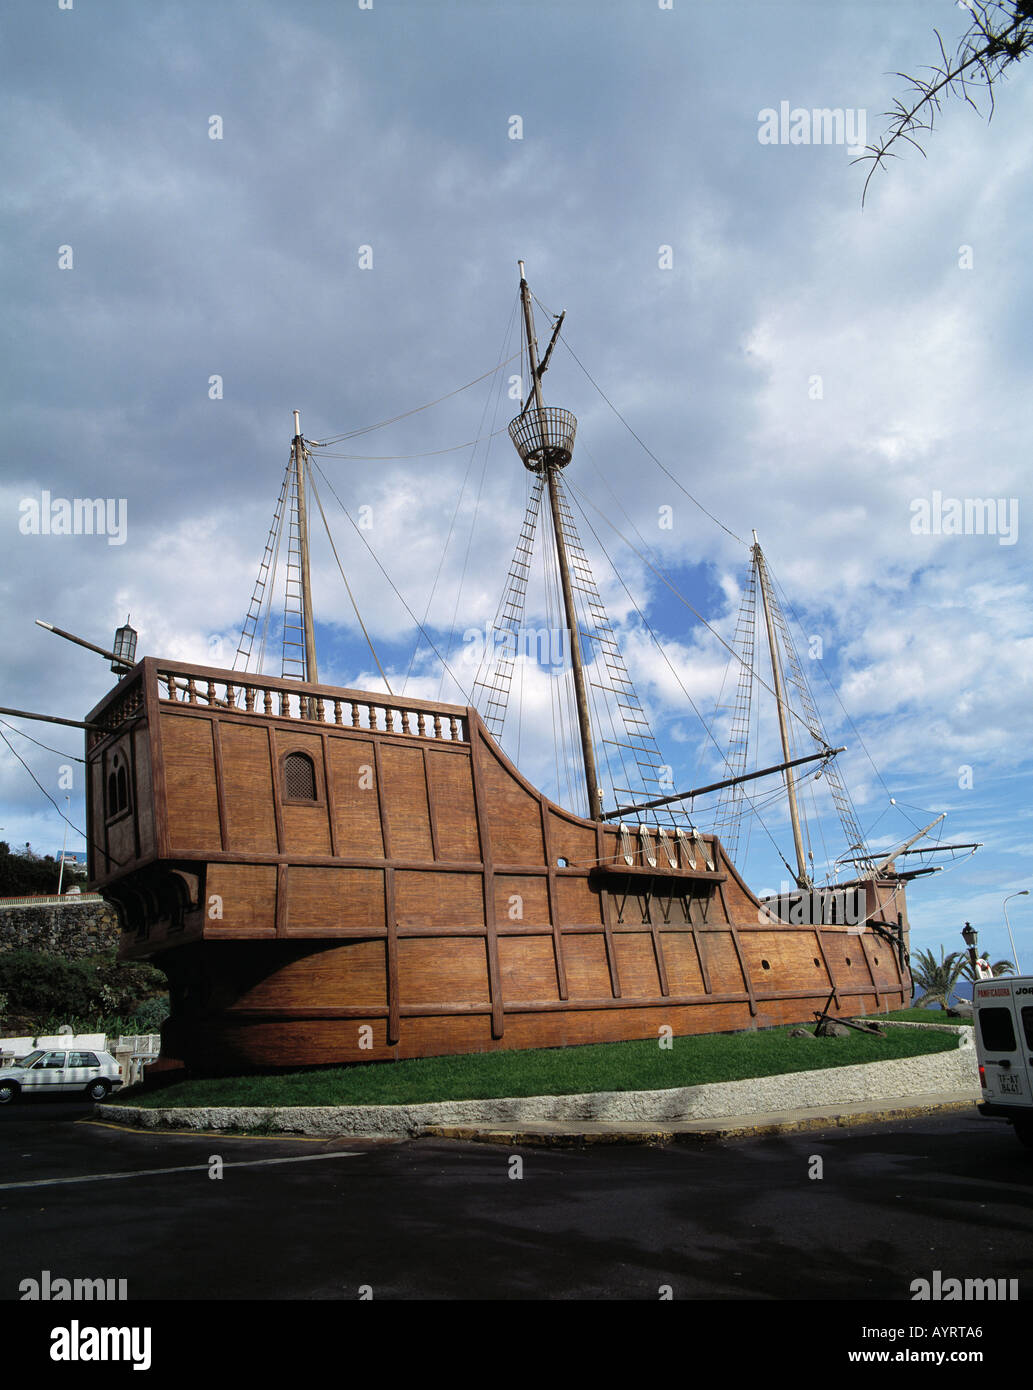 Kolumbus-Karavelle Santa Maria, Amerika-Entdecker, Schiffahrtsmuseum, Santa Cruz de la Palma, La Palma, Kanarische Stock Photo